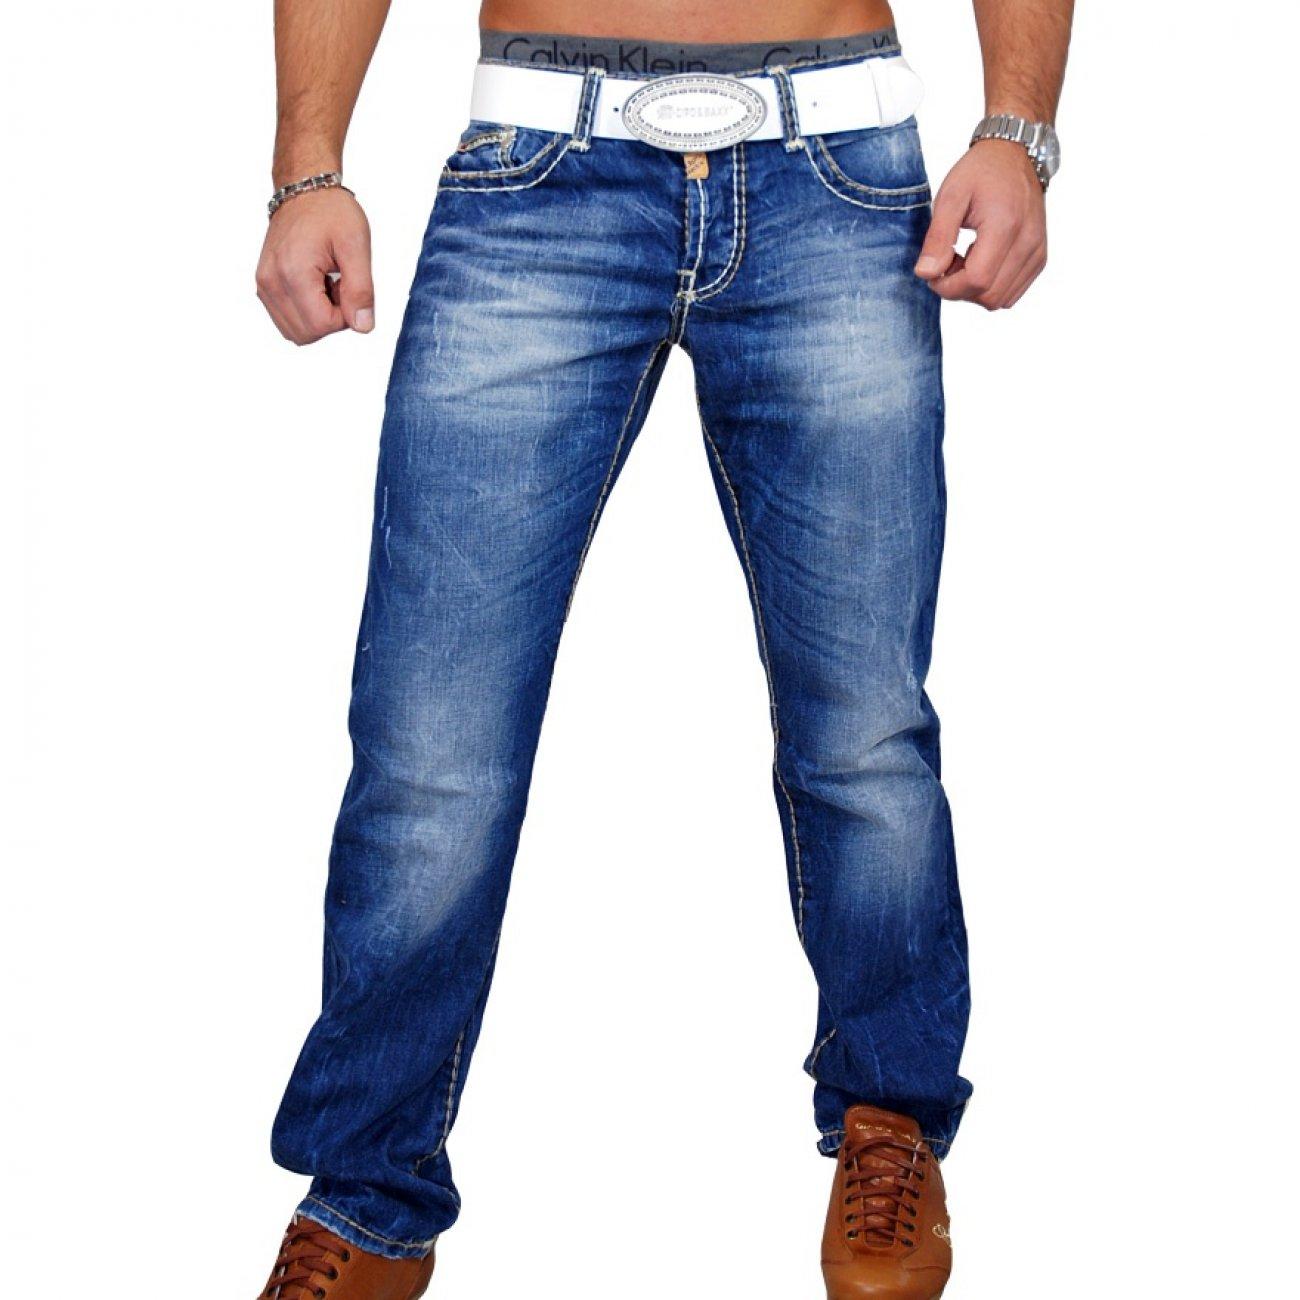 cipo baxx c 688 jeans herren blau herren jeans kaufen. Black Bedroom Furniture Sets. Home Design Ideas